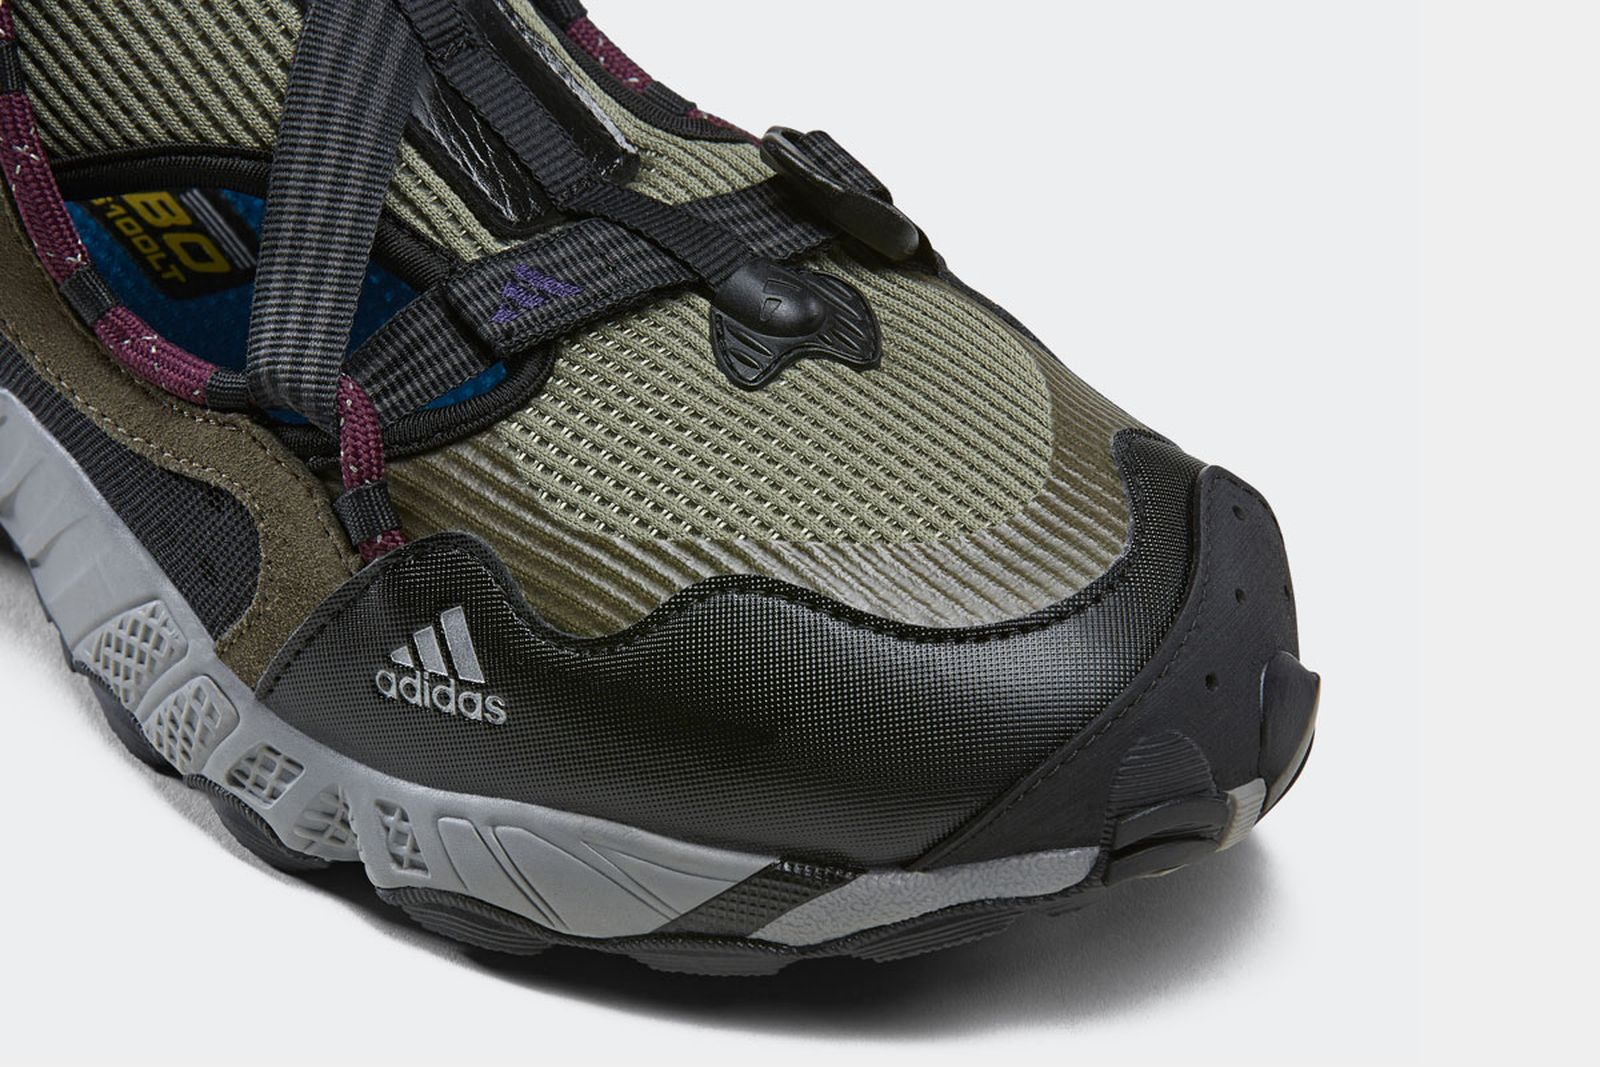 adidas gardening collection release date price detail adidas consortium